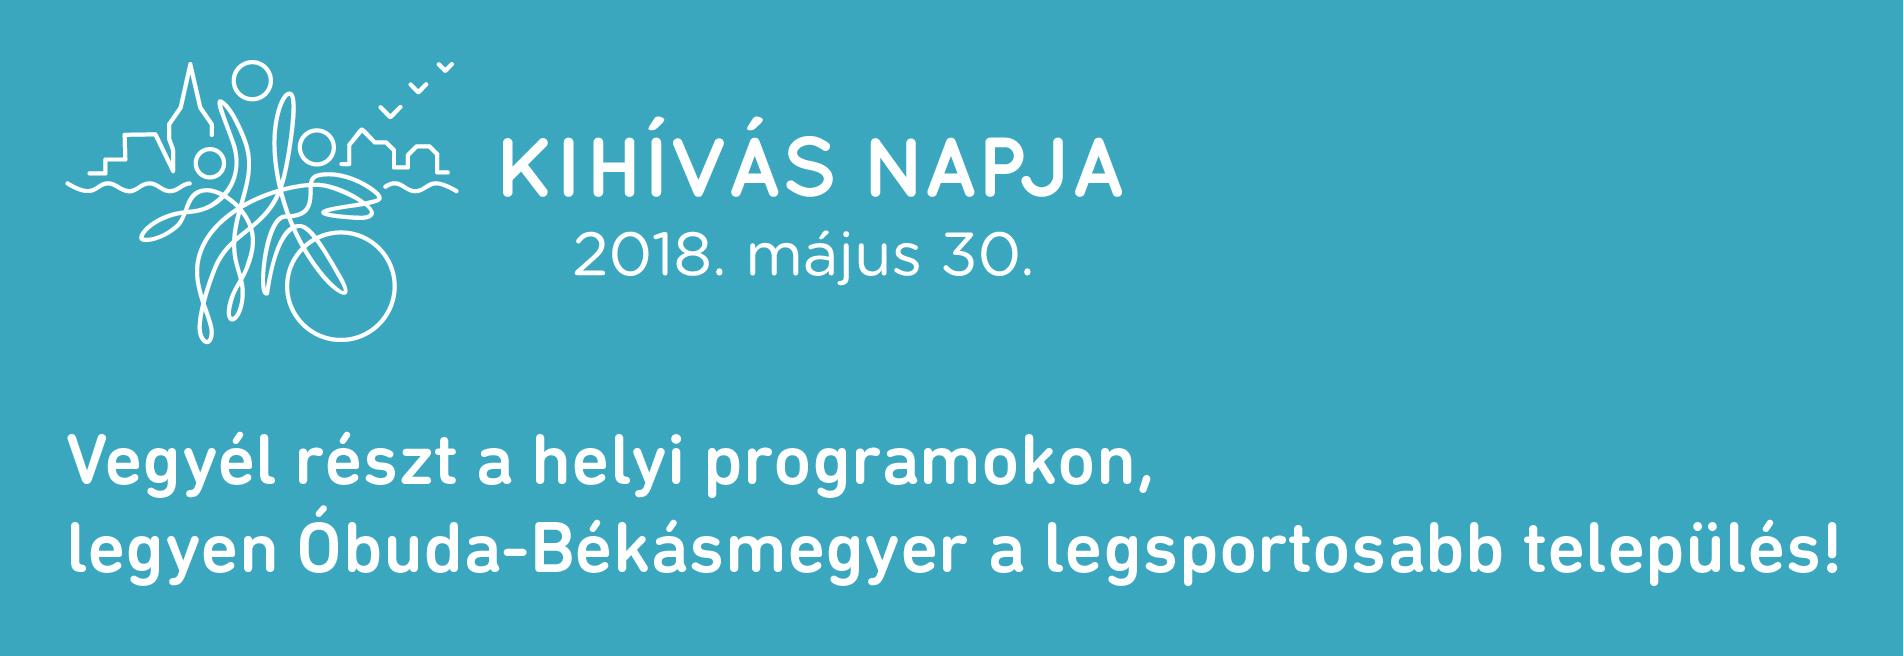 kihivas_napja_slider-01